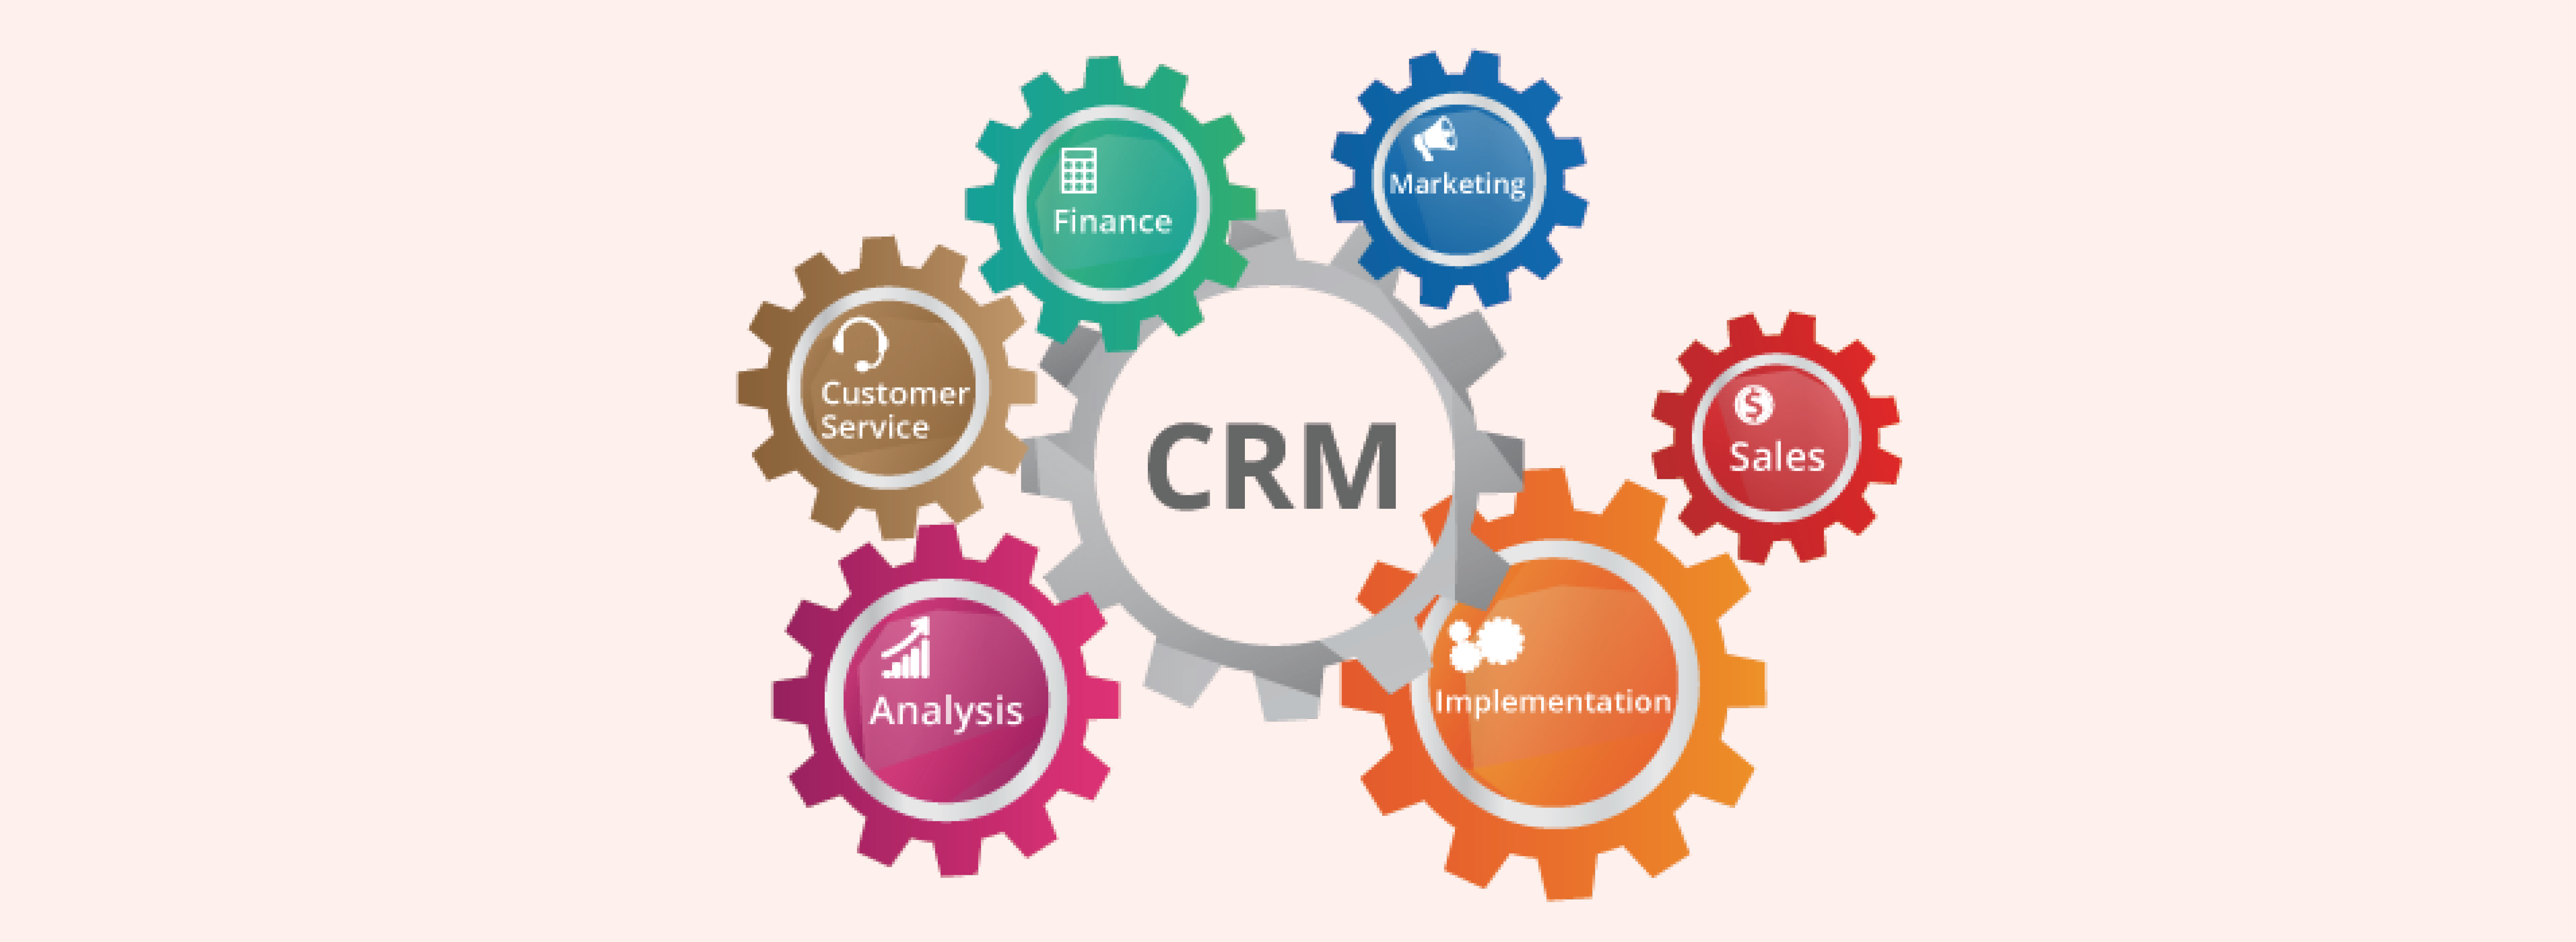 CRM, una herramienta indispensable